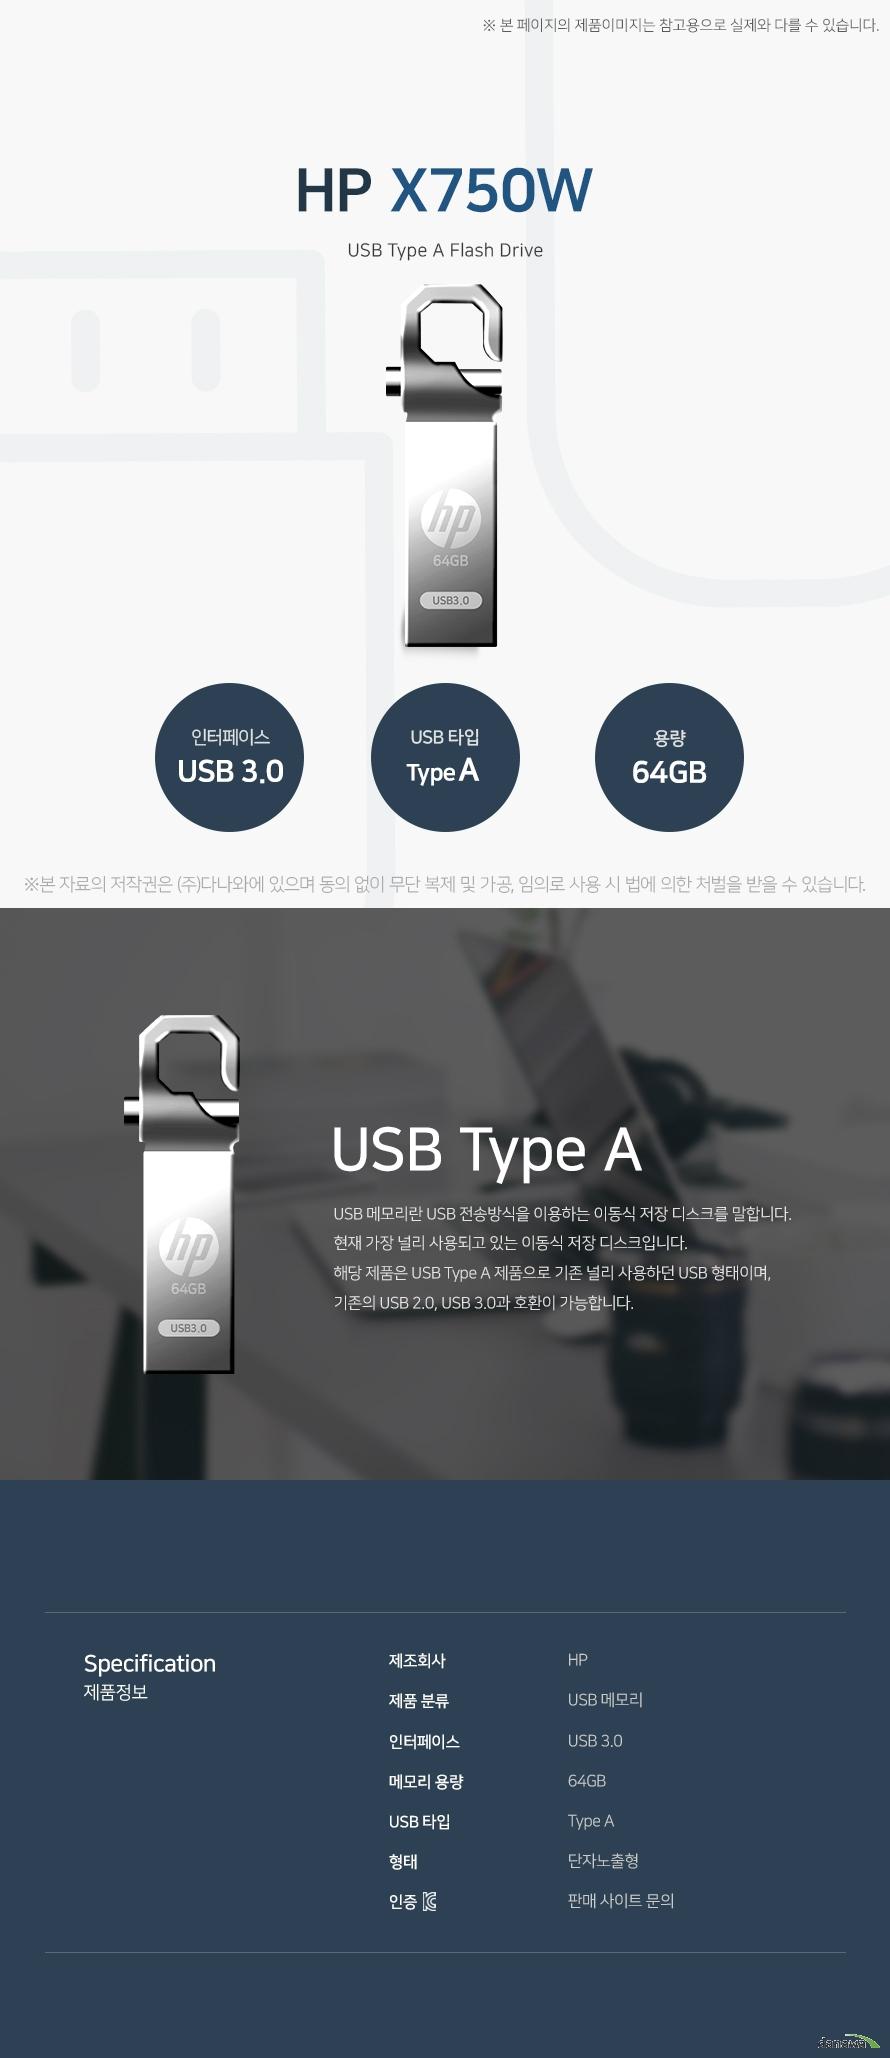 HP X750W (64GB) / USB 메모리 / USB 3.0 / 단자노출형 /